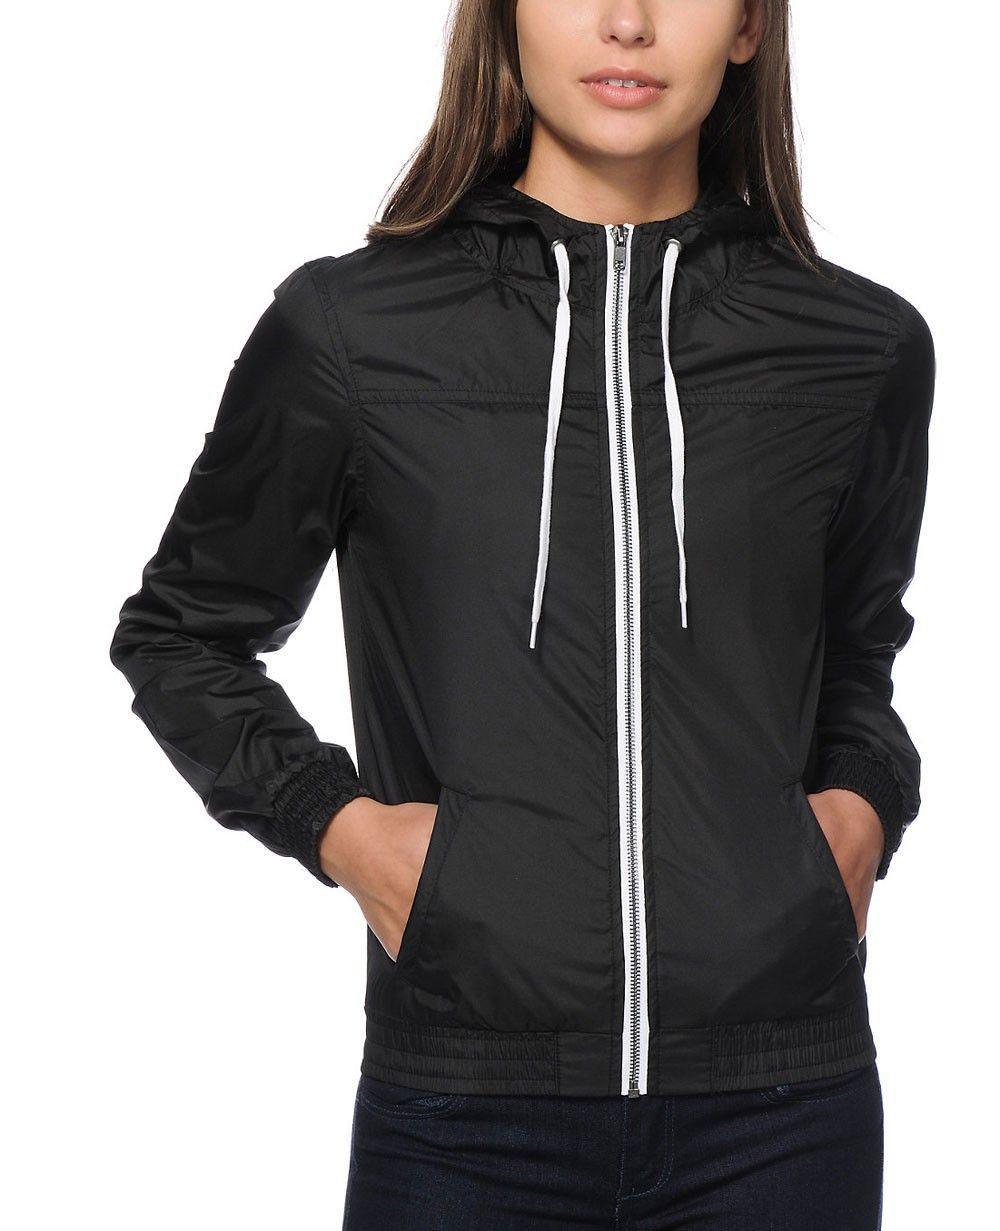 feecf0f09a5 ... Windbreaker Coat Outerwear Bomber Jackets …  http   www.quickapparels.com women-long-zipper-